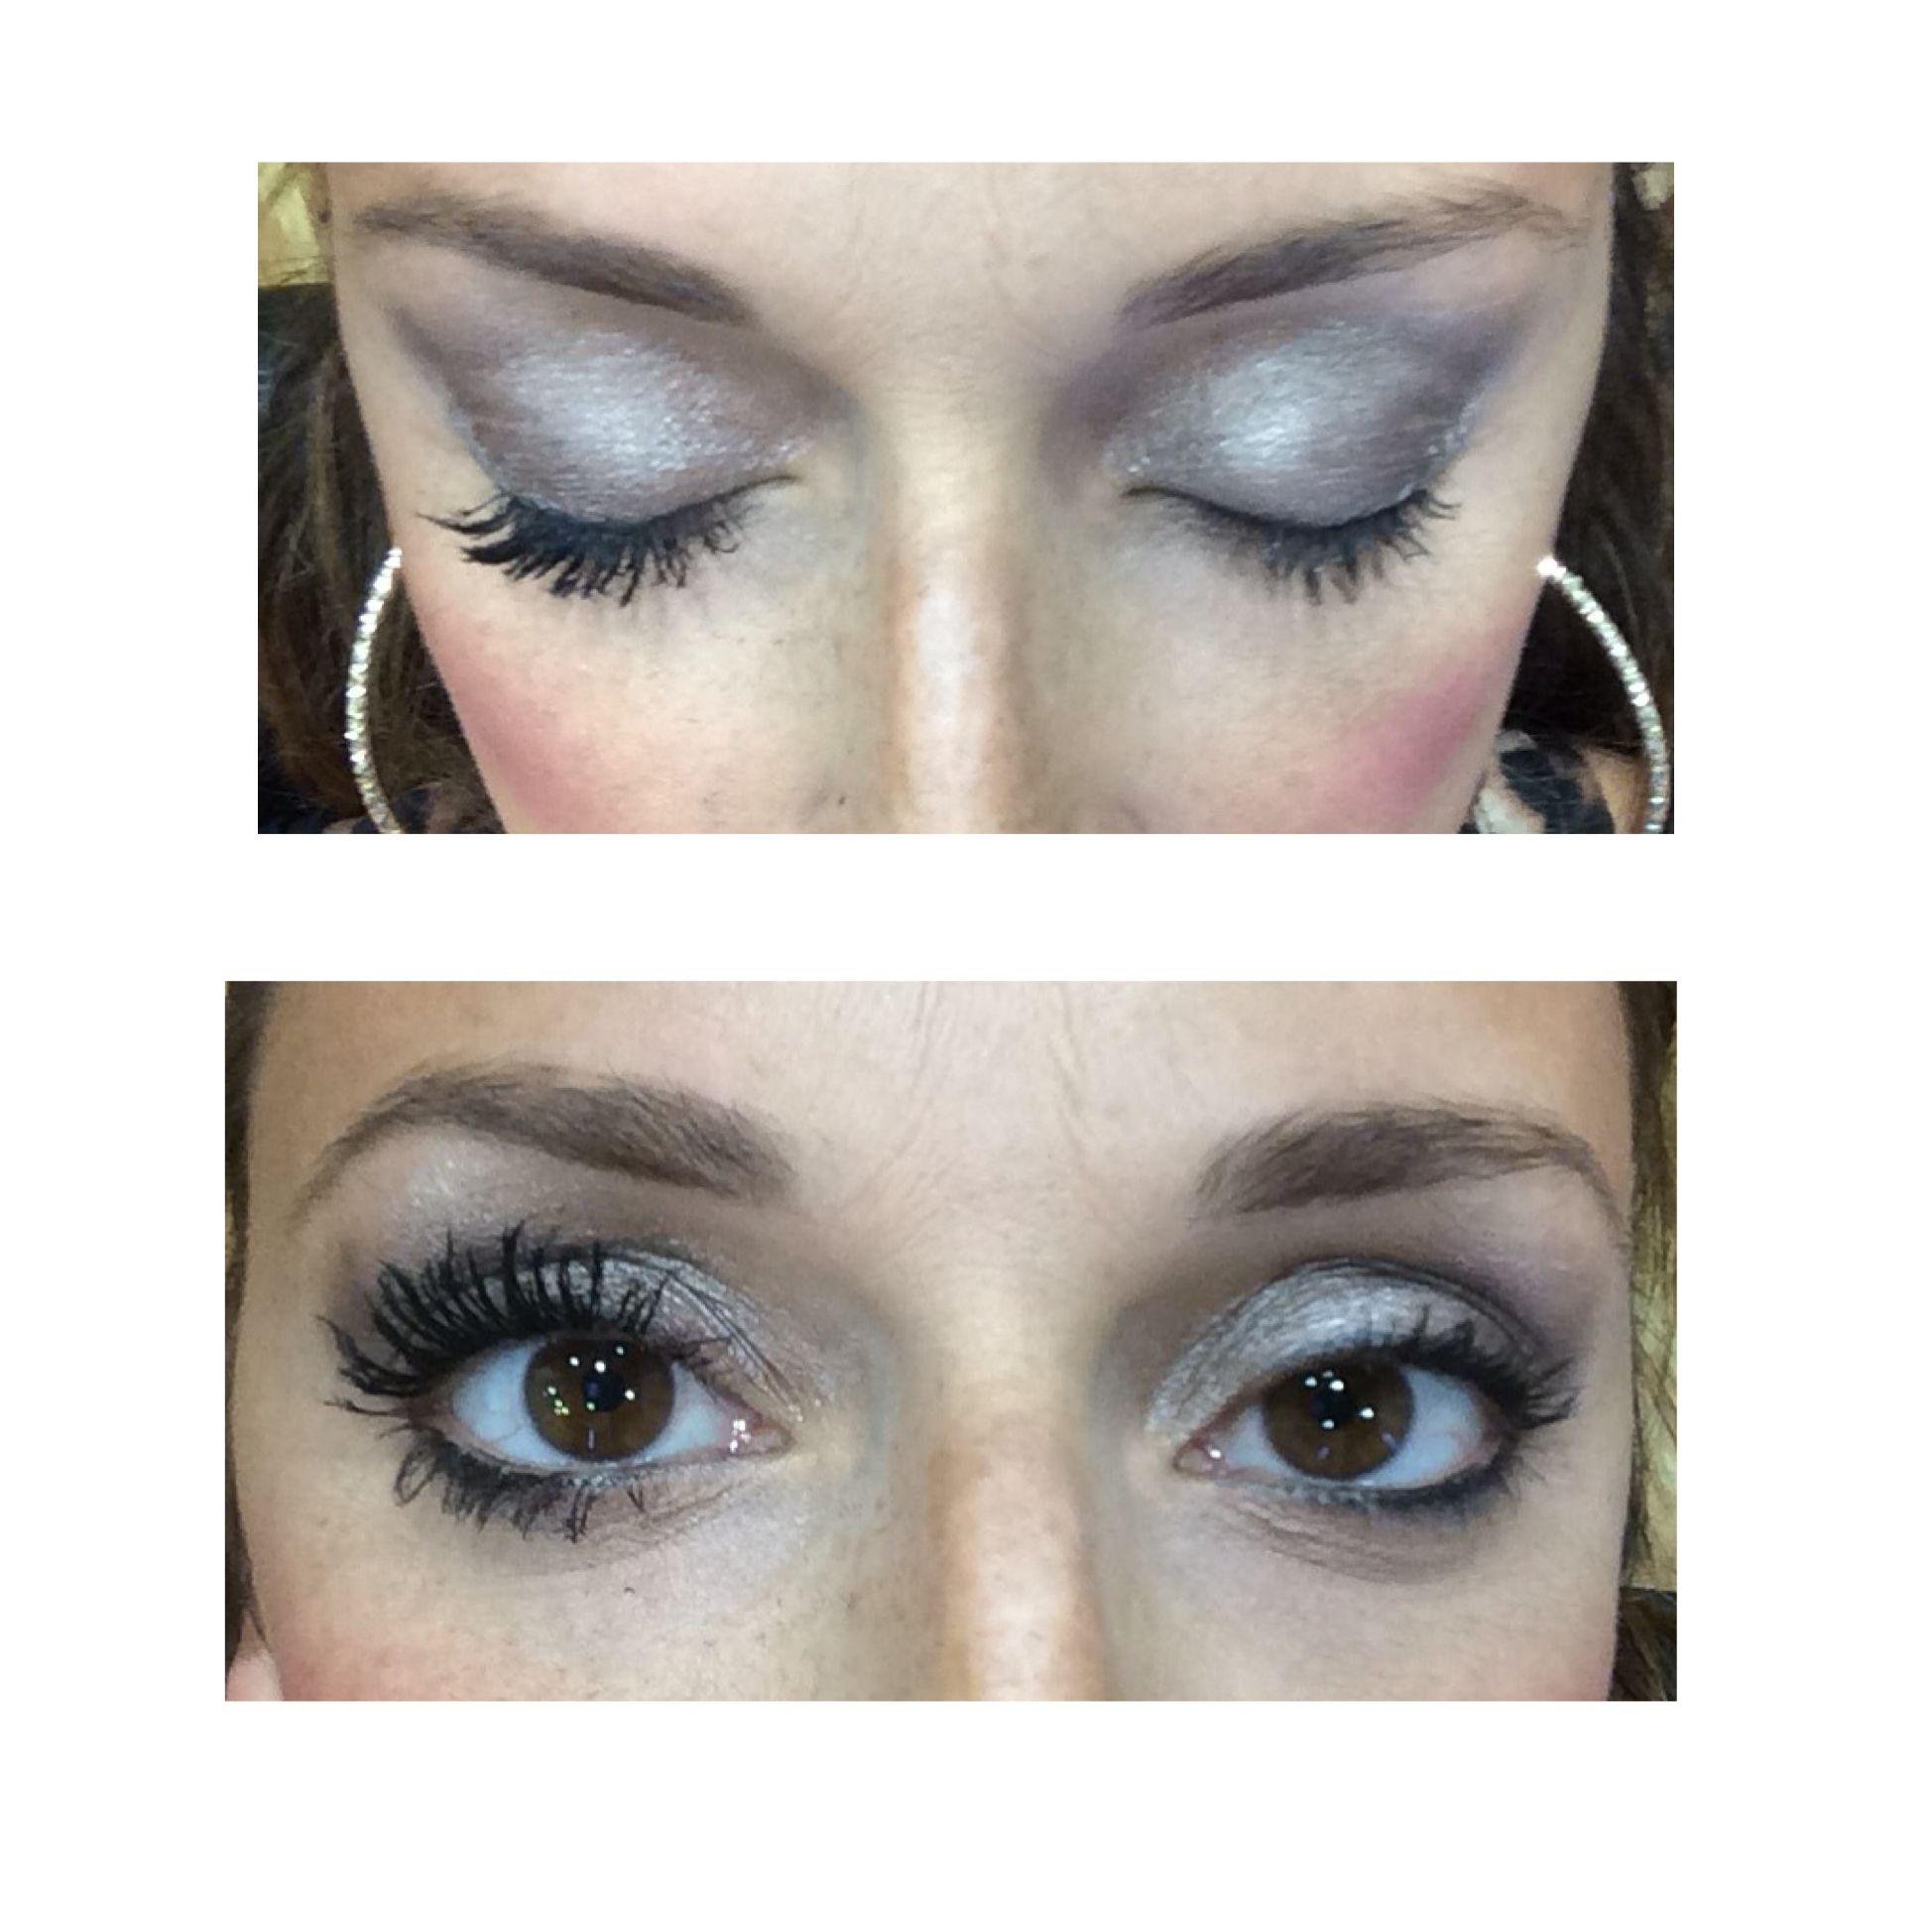 d0b7d114295 Left side 3d fiber lash mascara, right side drugstore mascara. No falsies!  No extensions! All natural ingredients!